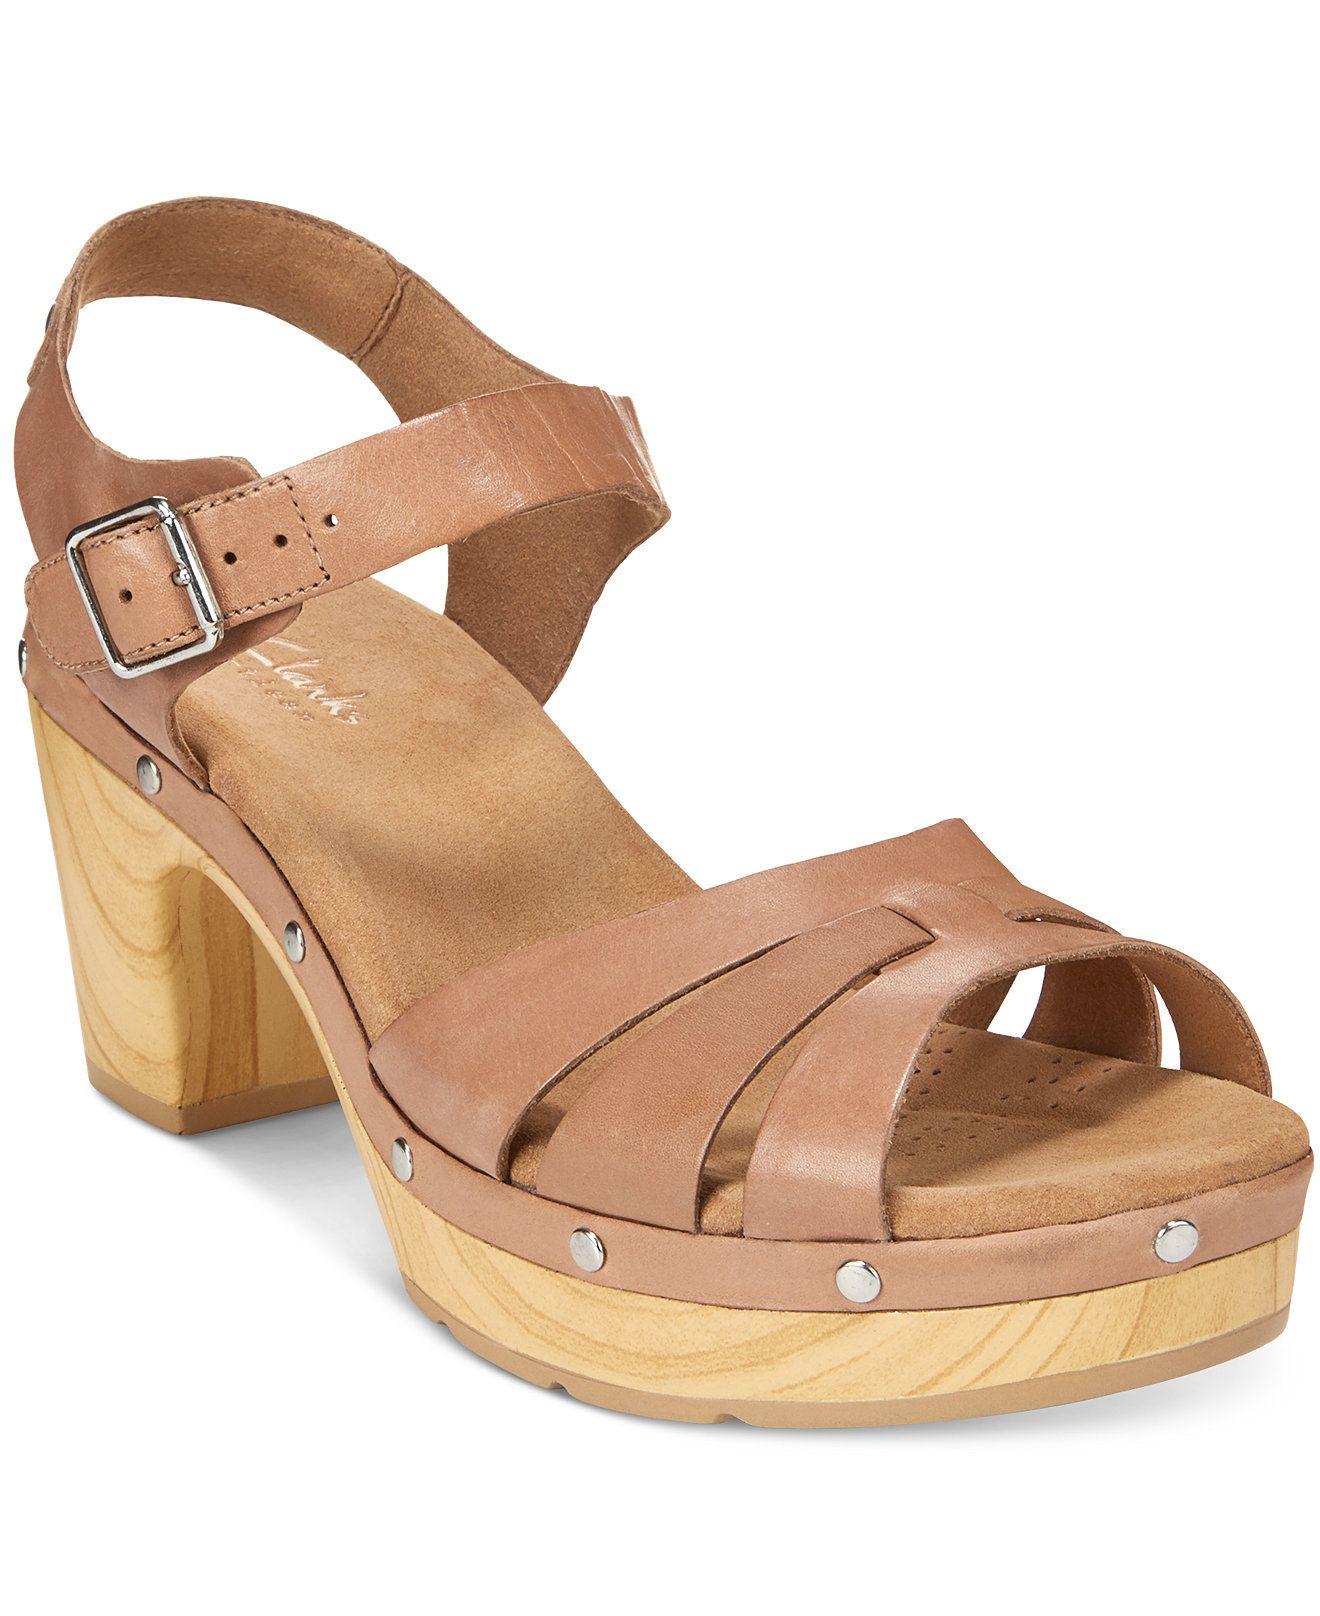 clarks artisan platform sandals